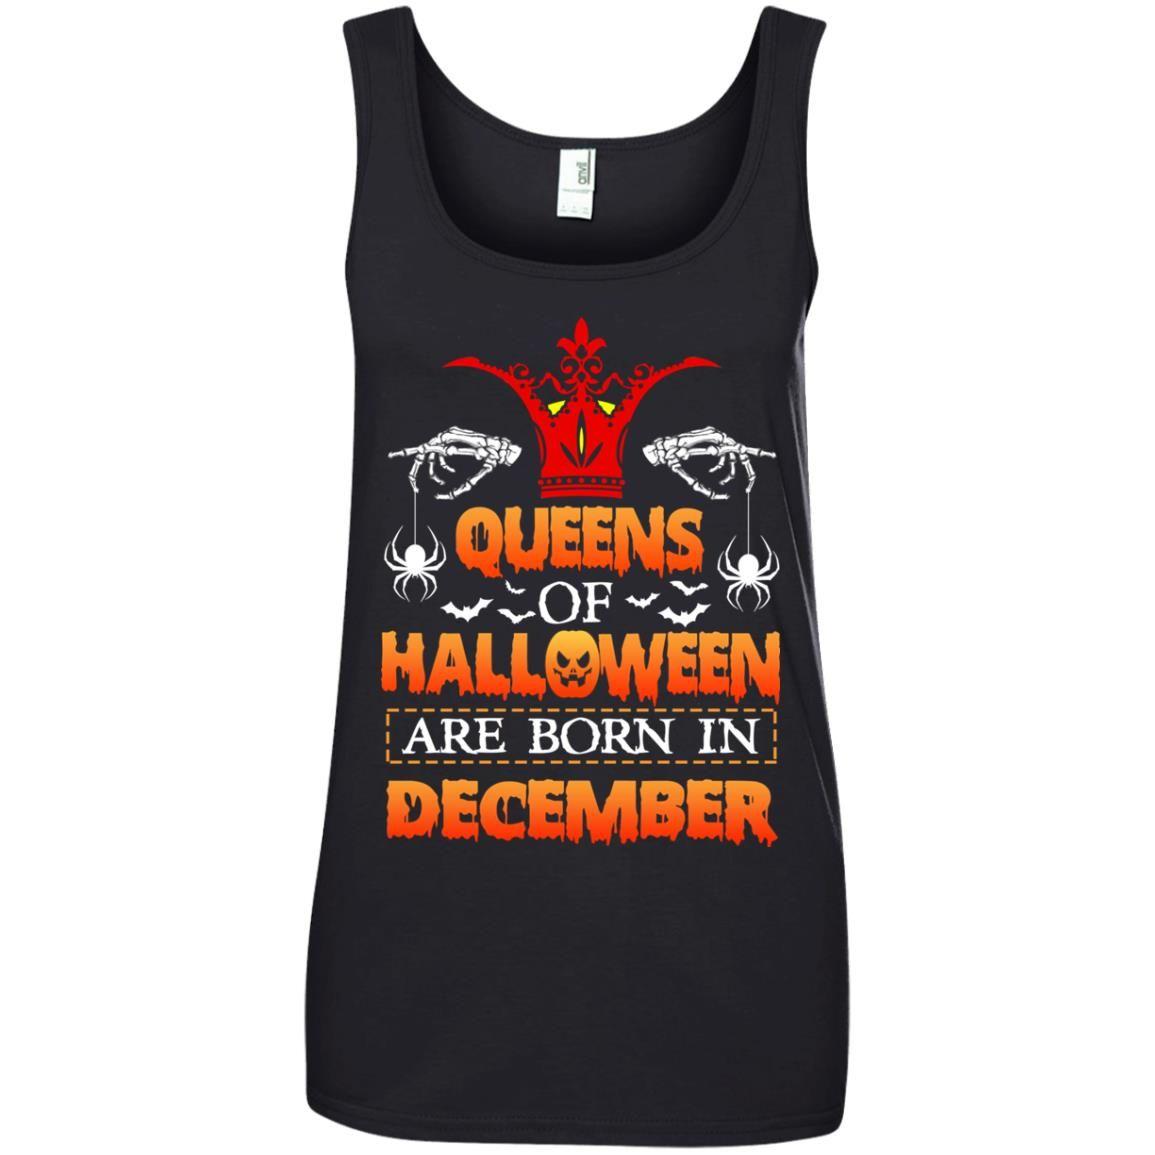 image 968 - Queens of Halloween are born in December shirt, tank top, hoodie